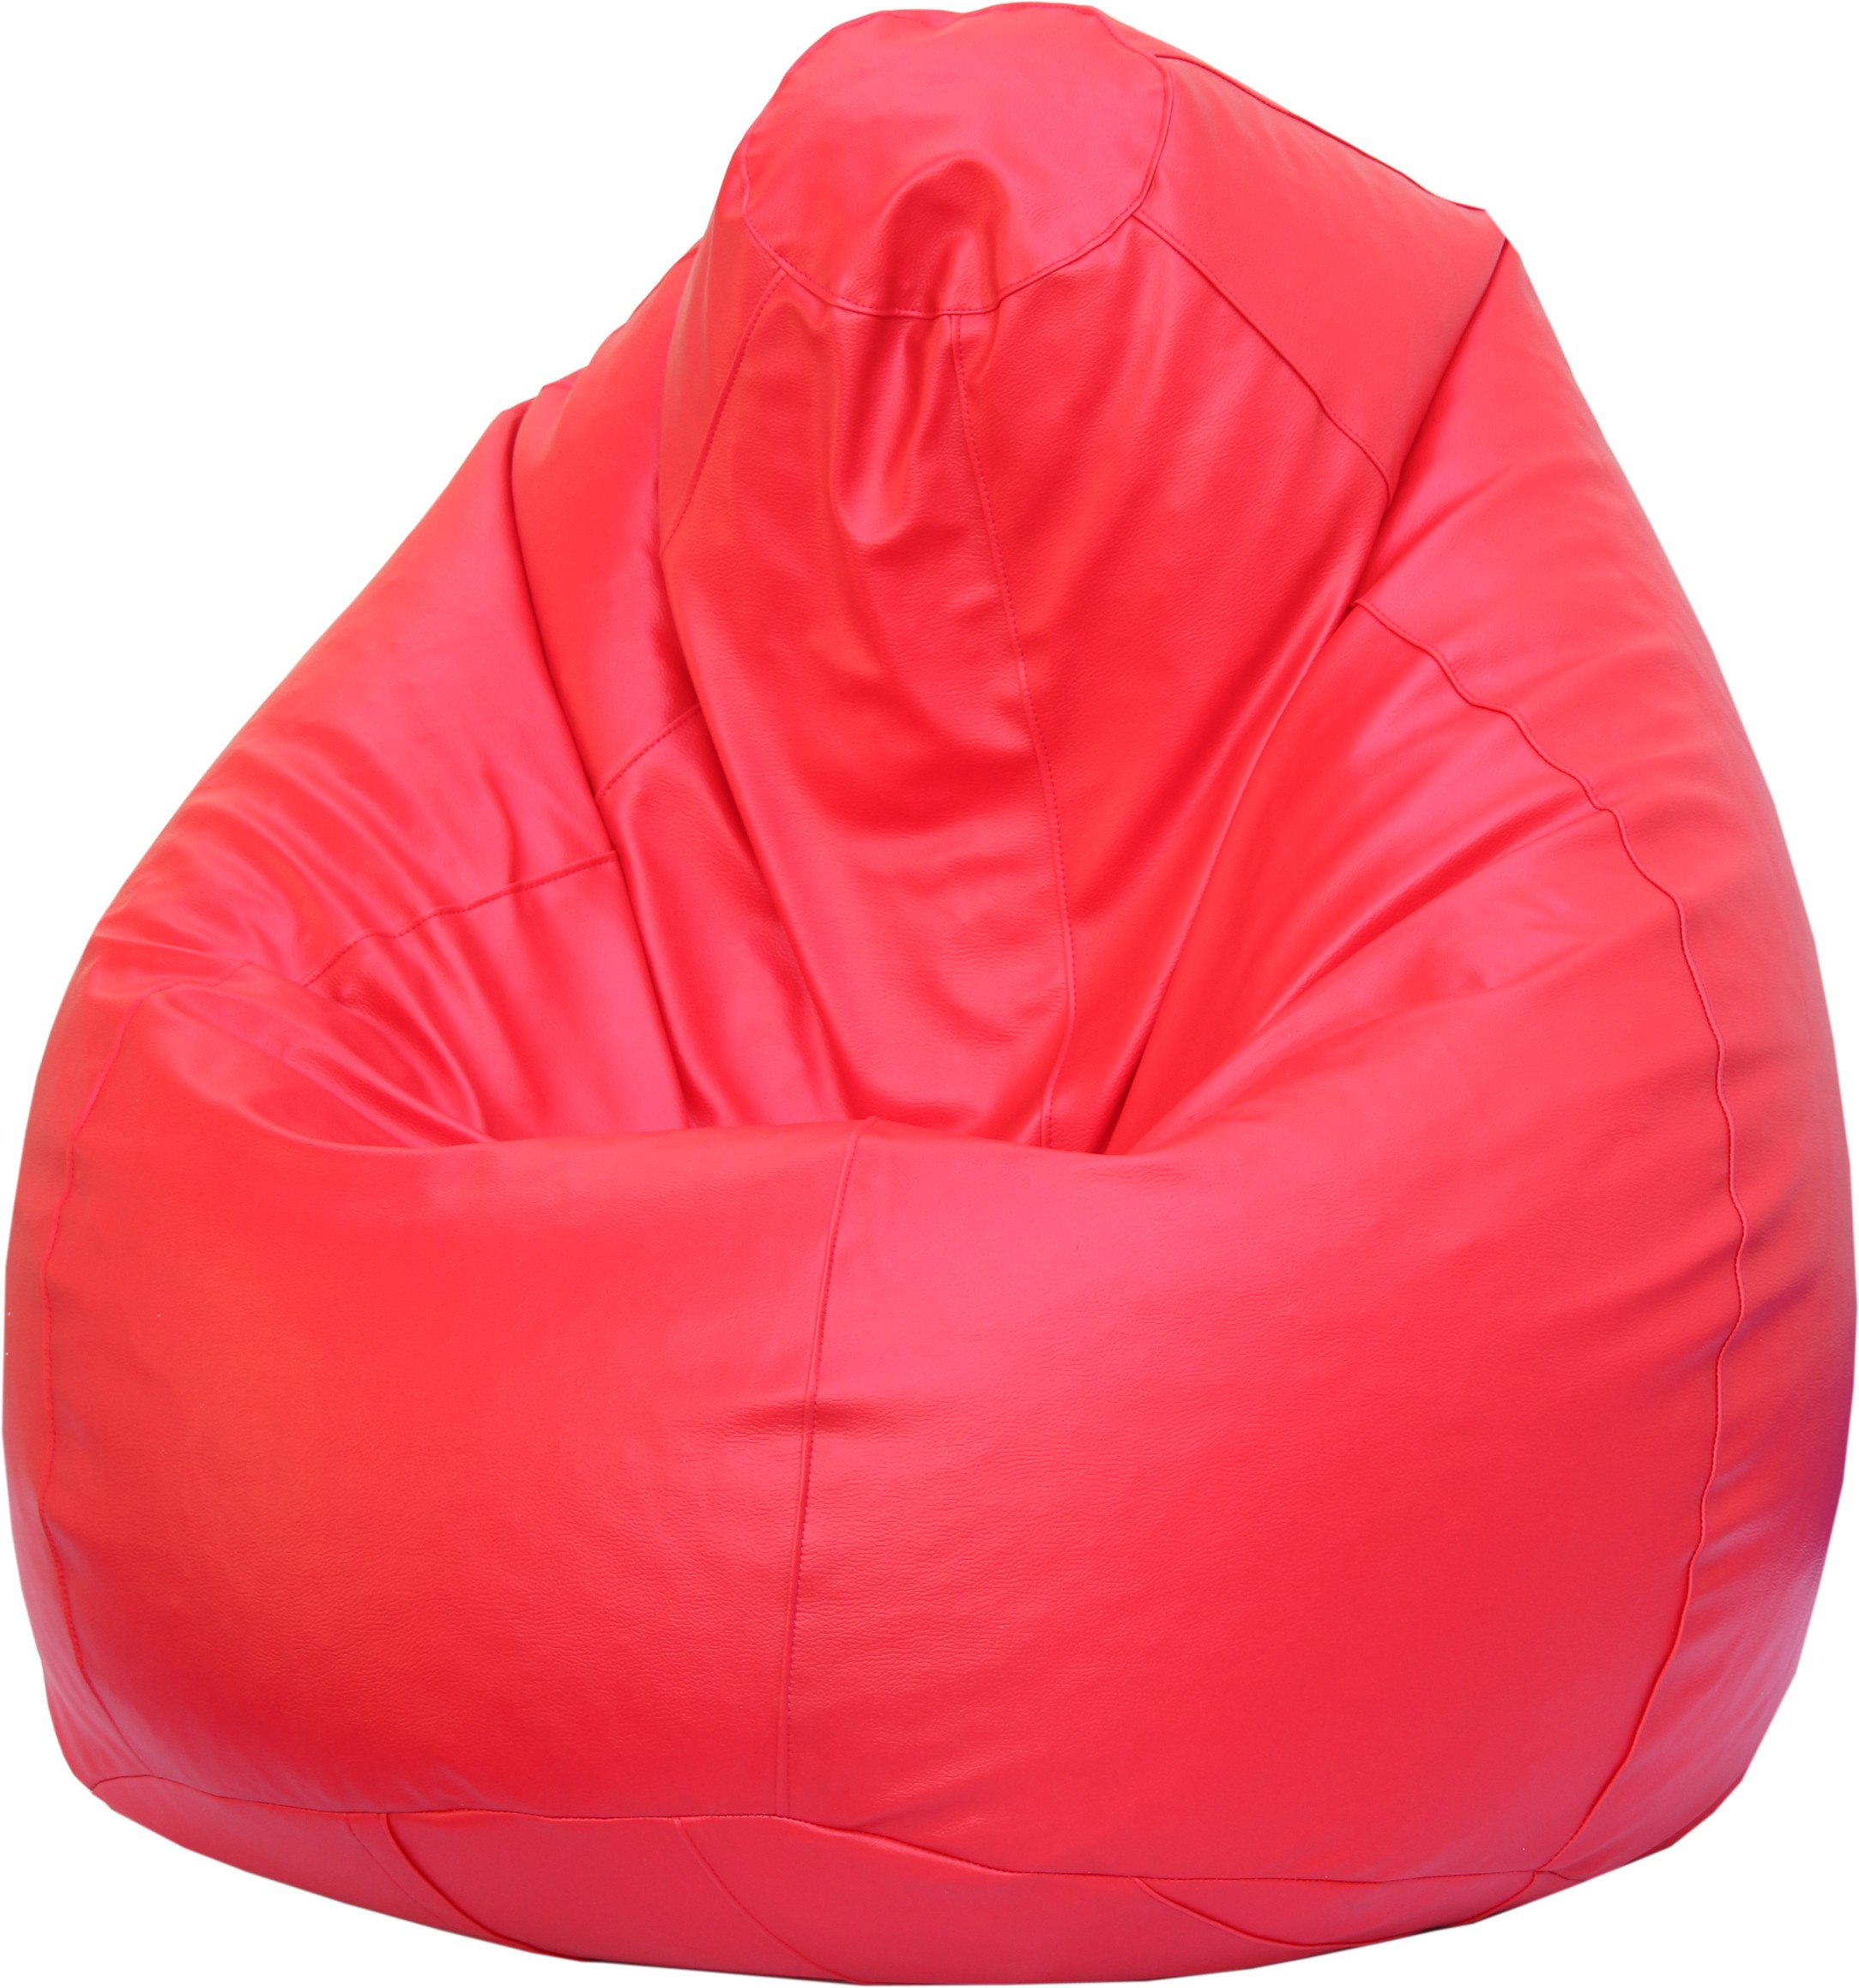 View Beanskart XL Bean Bag XL (Filled With Beans) Bean Bag  With Bean Filling(Red) Furniture (Beanskart)